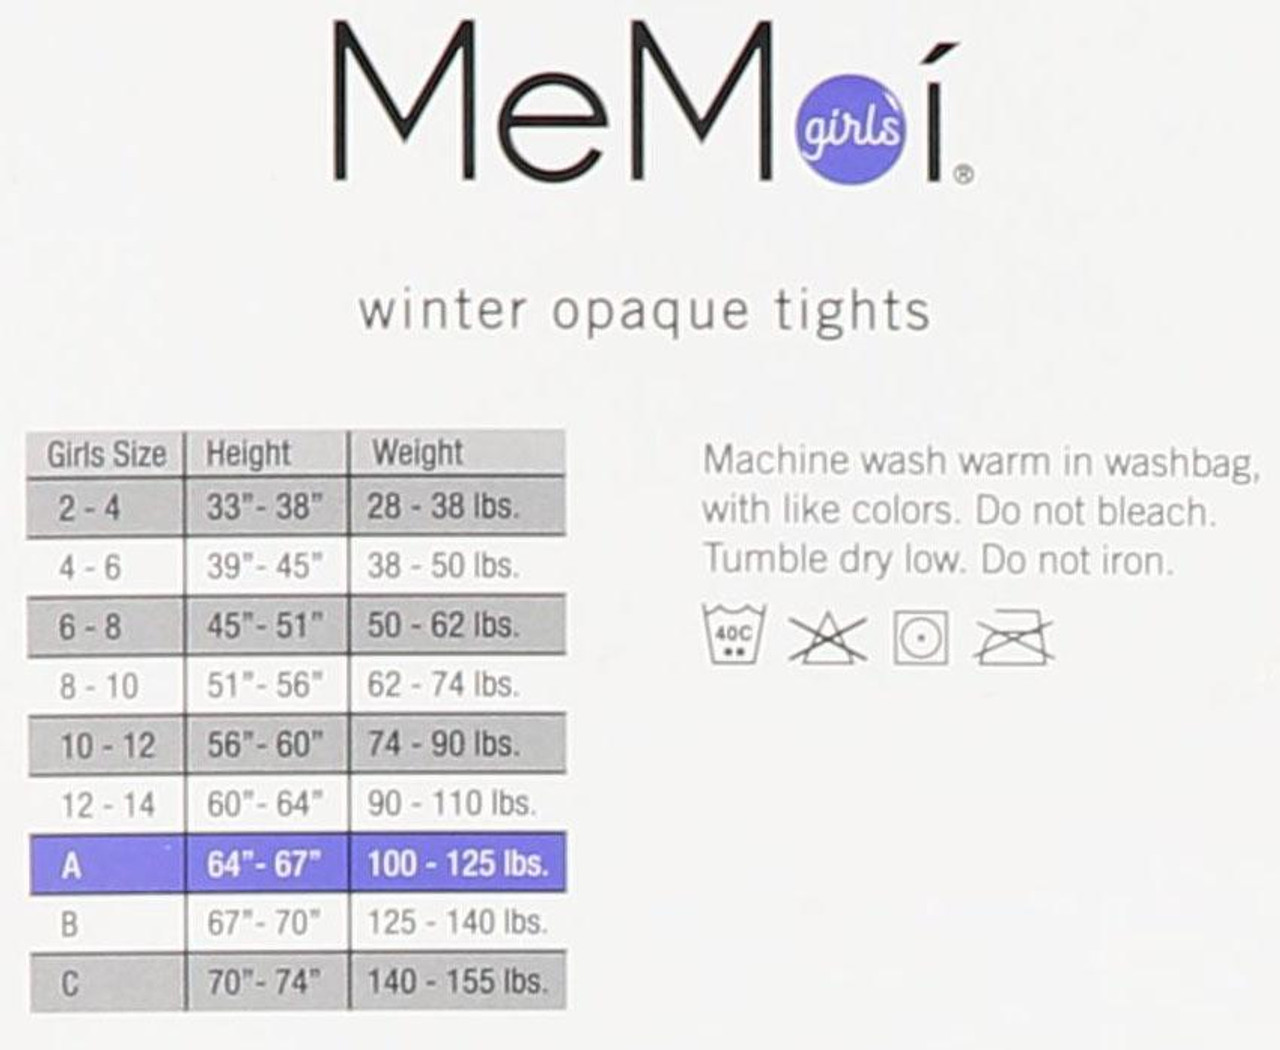 Memoi Girls Winter Opaque Tights